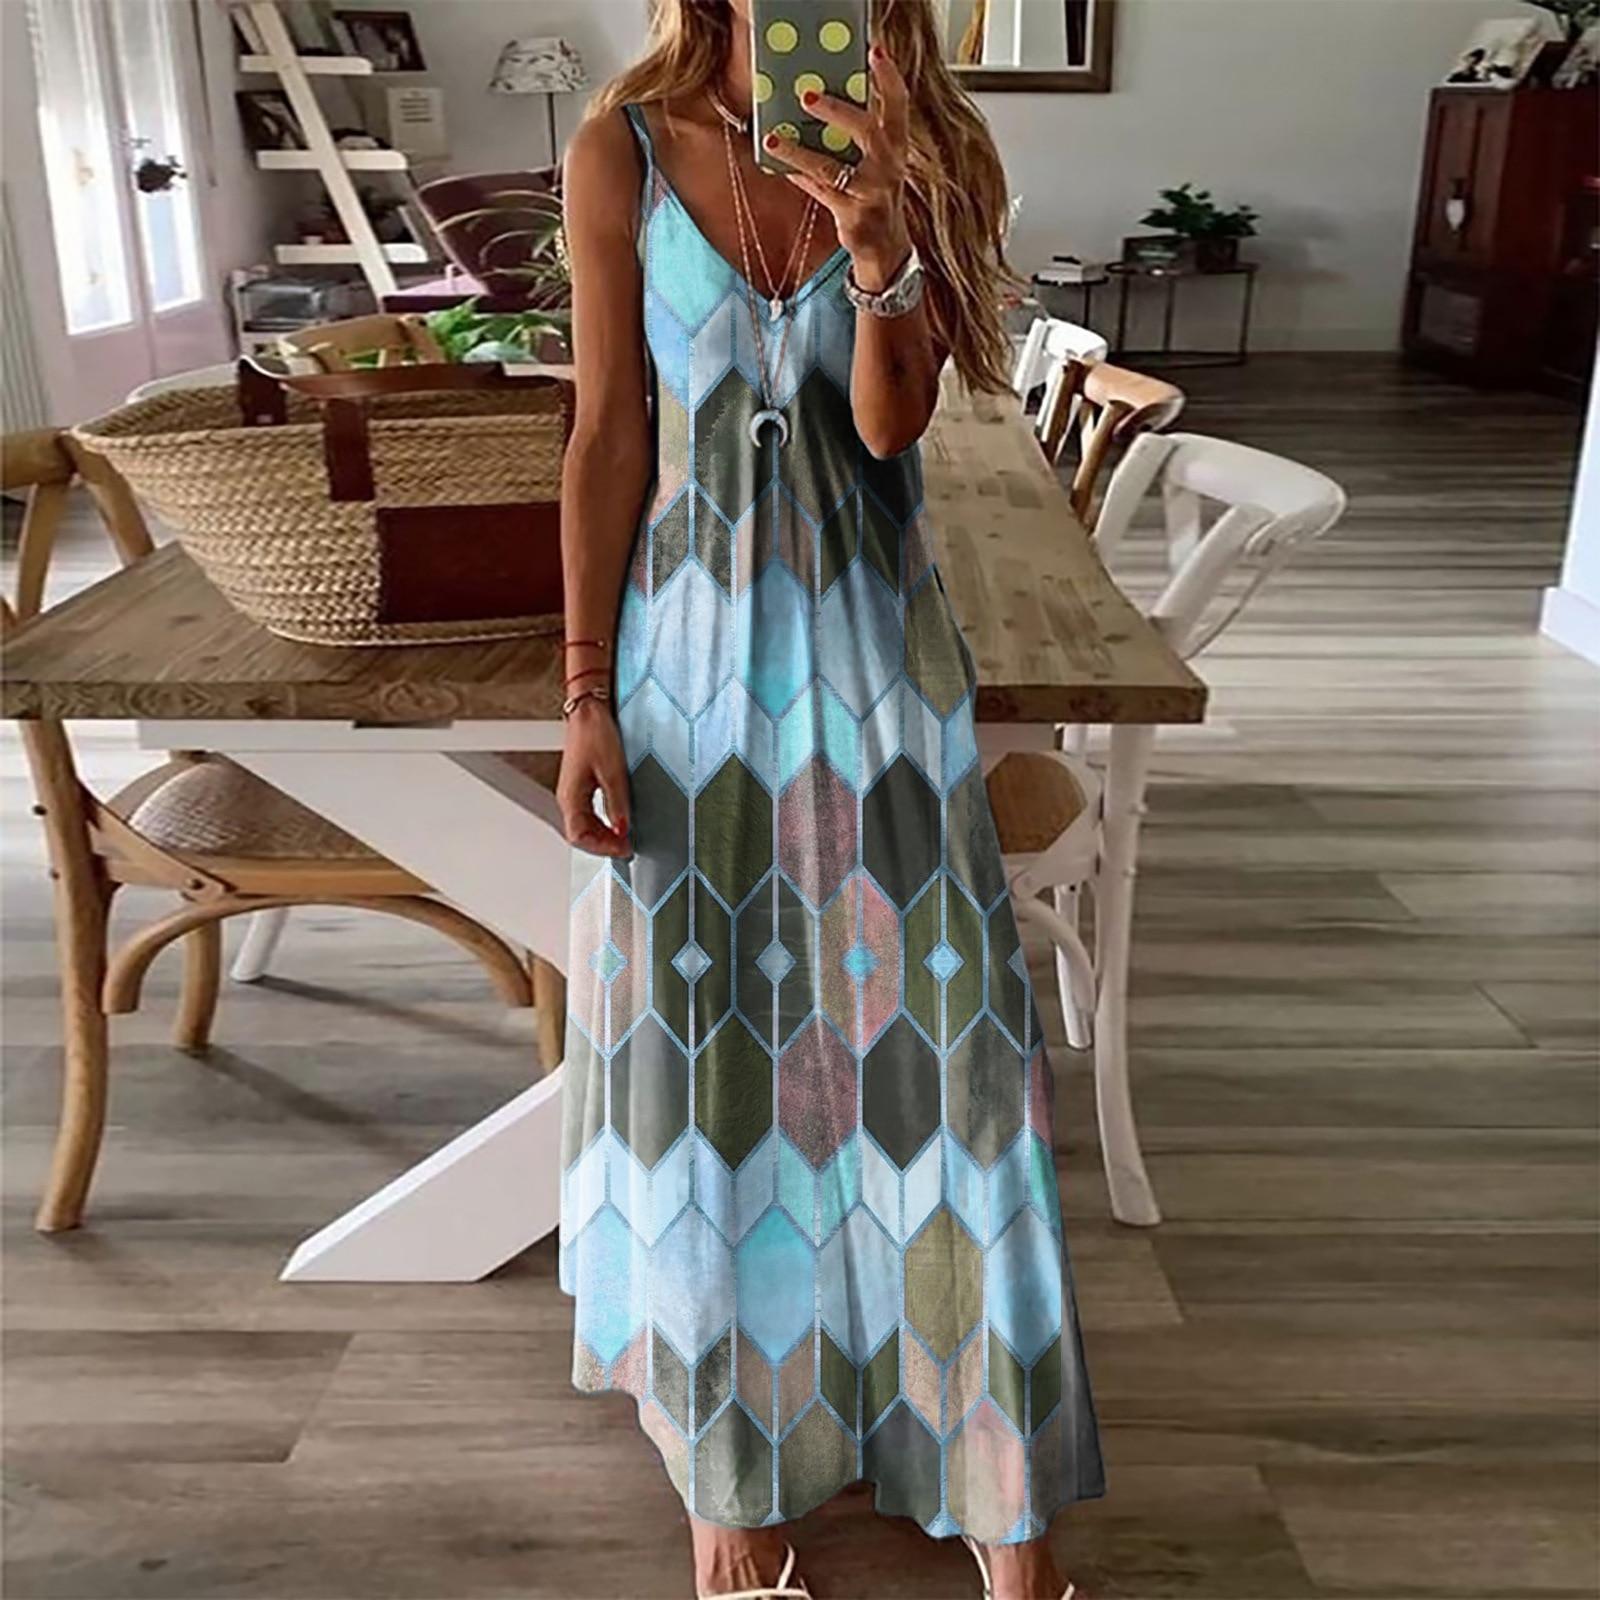 Women's Summer Casual Printed Camisole Long Dress Fashion Sexy Plus Size Dress Bohemian Dress 7